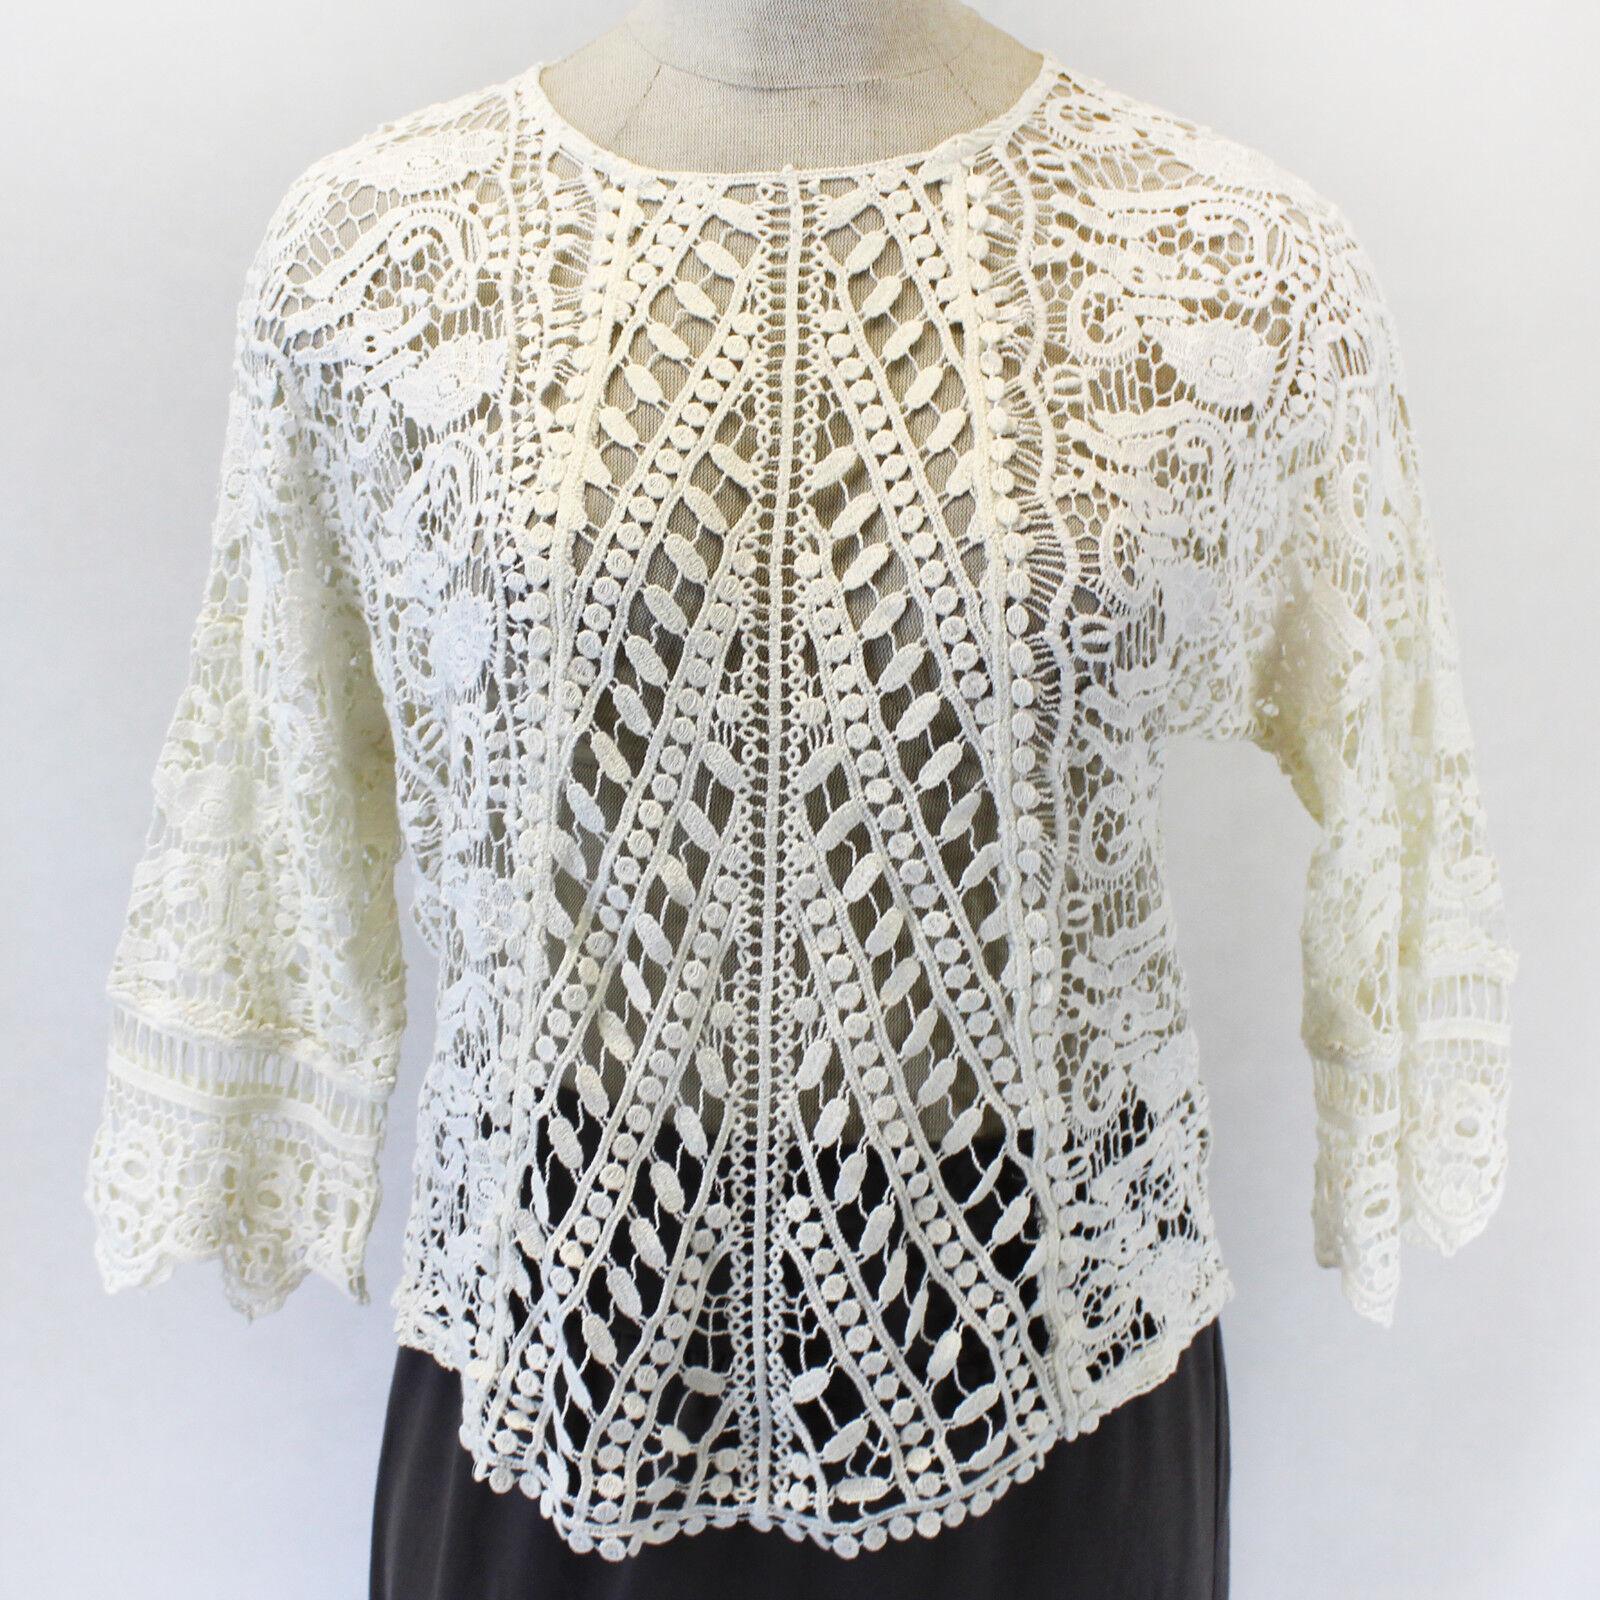 NEW XCVI Lagenlook Open Lace Knit Ivory 100% Cotton Asymmetric Blouse Top XL